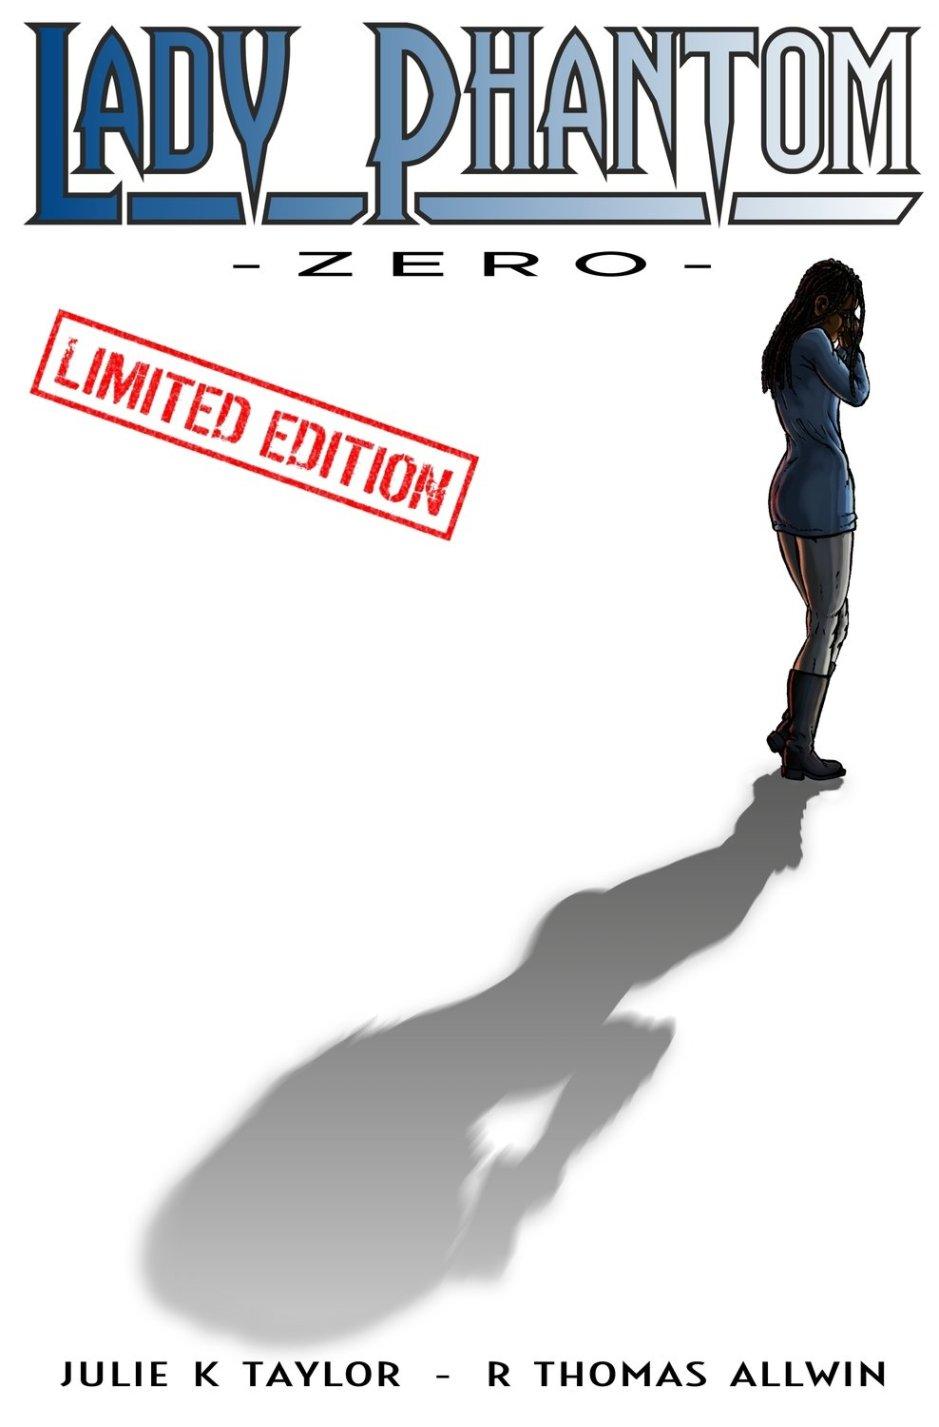 Lady Phantom Issue Zero, Limited Edition